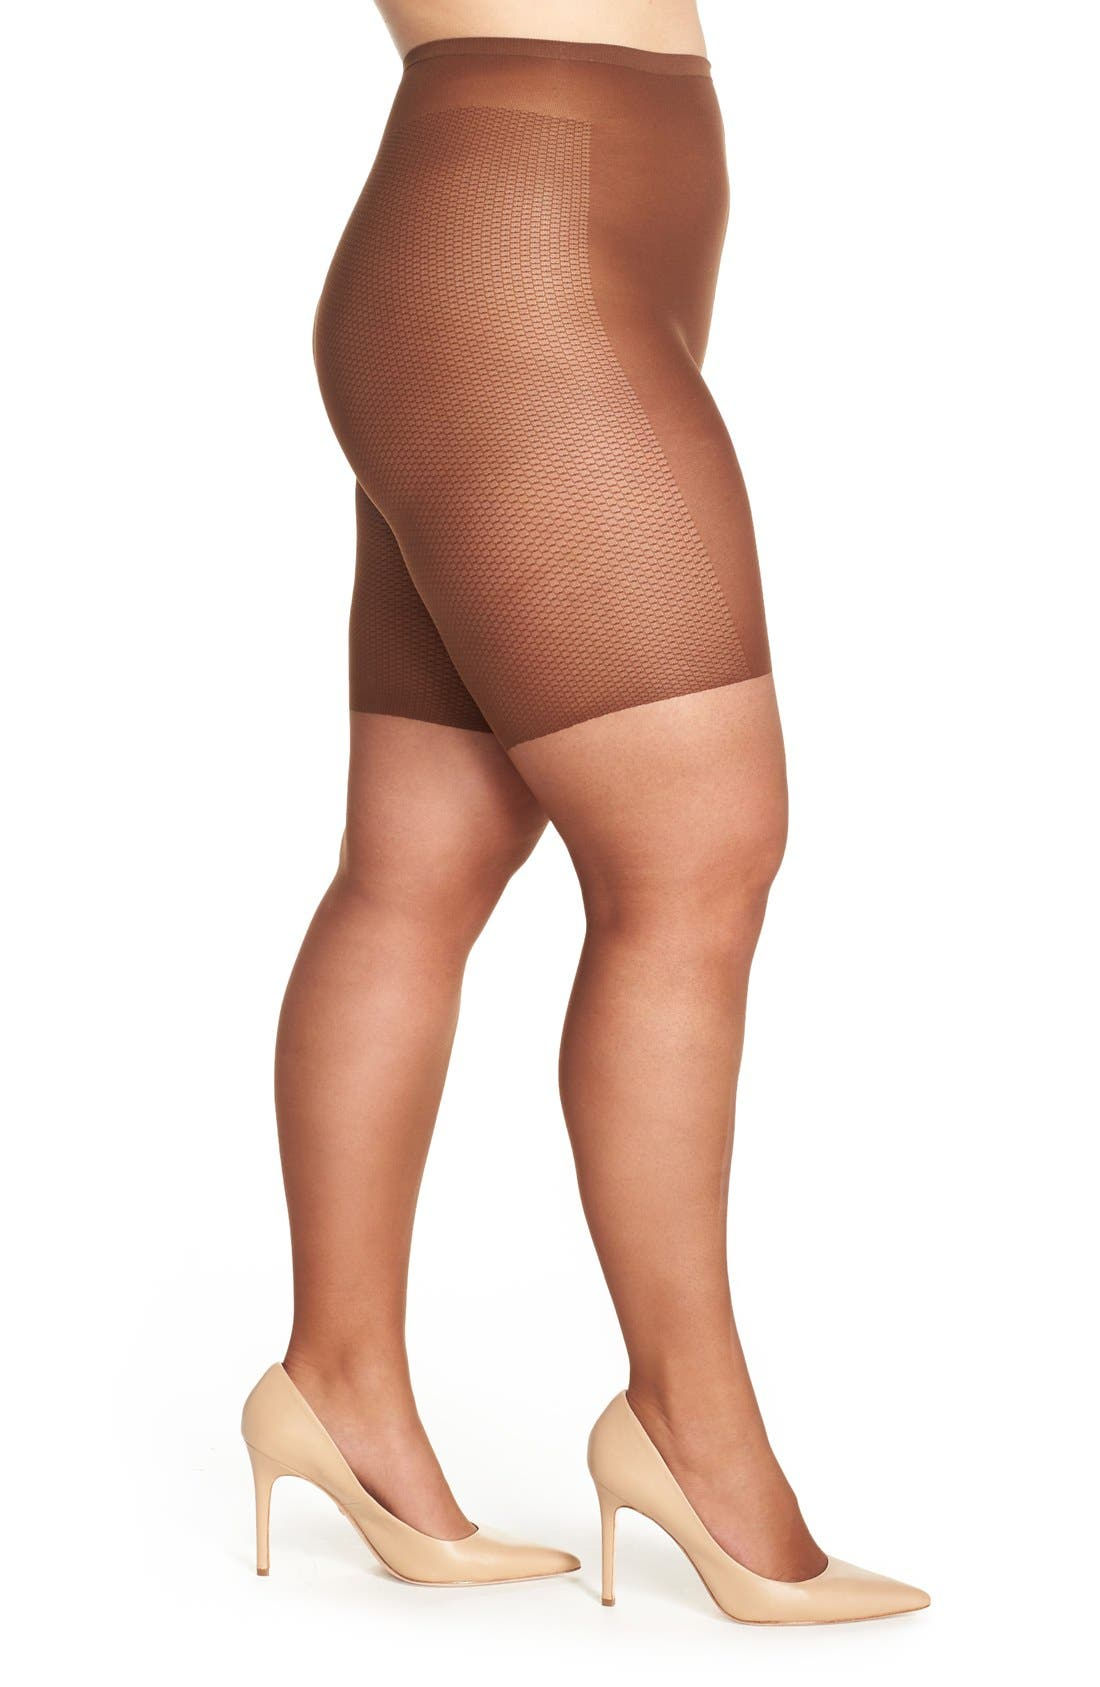 Berkshire Light Control Top Pantyhose (Plus Size)